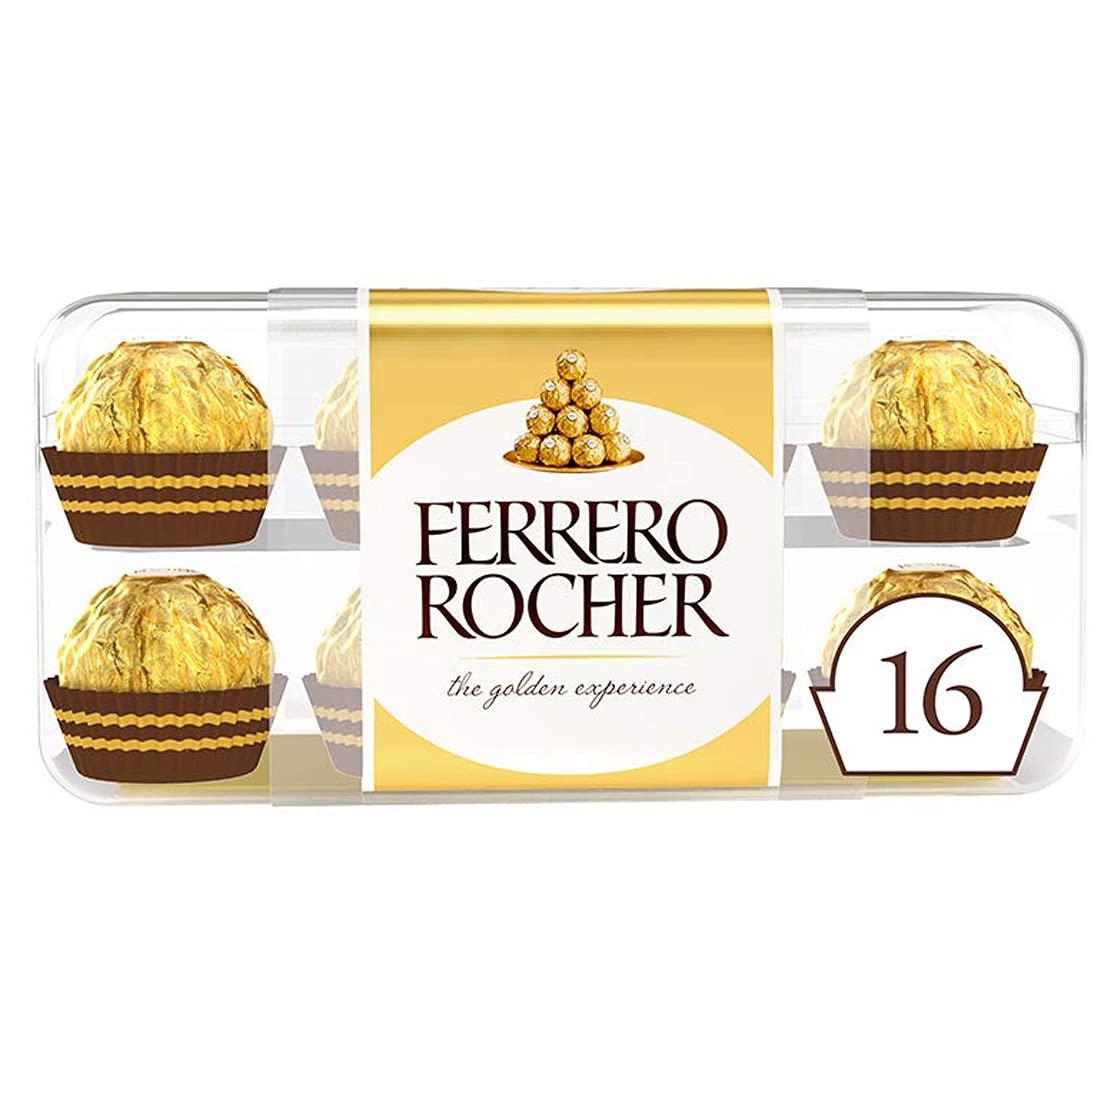 Ferrero Rocher, 16 Pieces, 200 gm 1